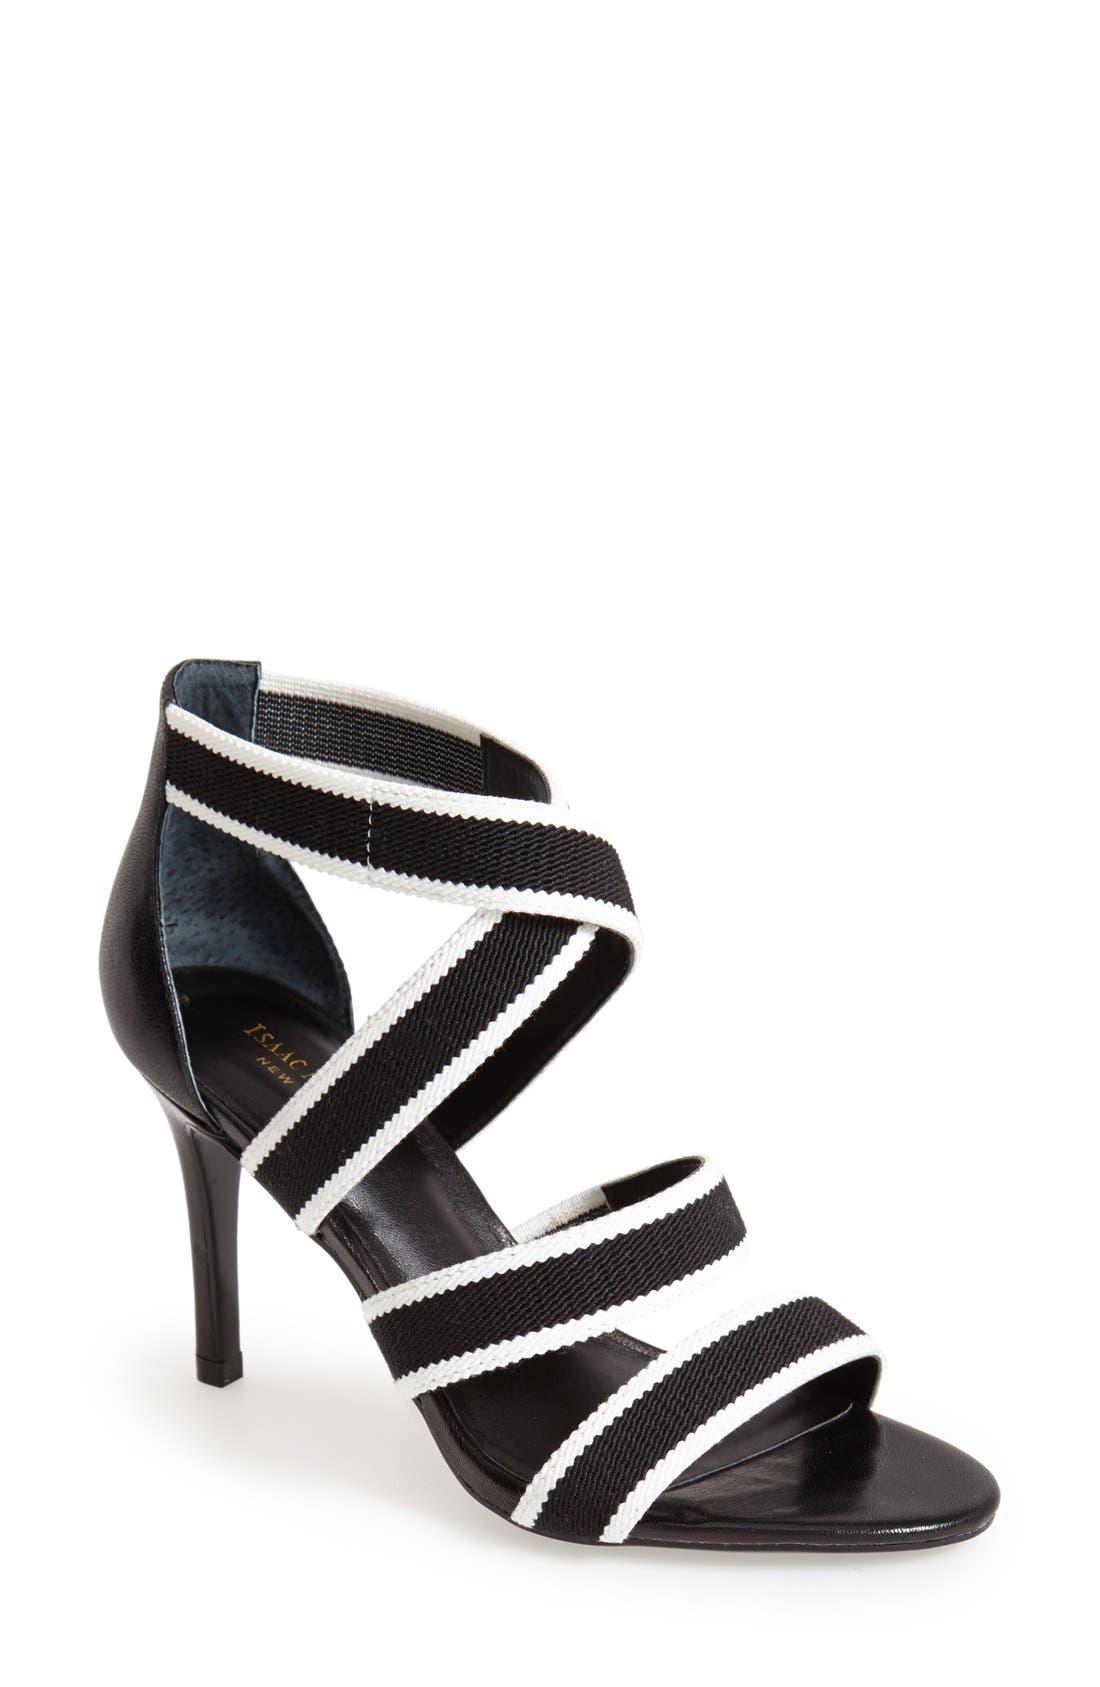 Main Image - Isaac Mizrahi New York 'Pennie' Sandal (Women)